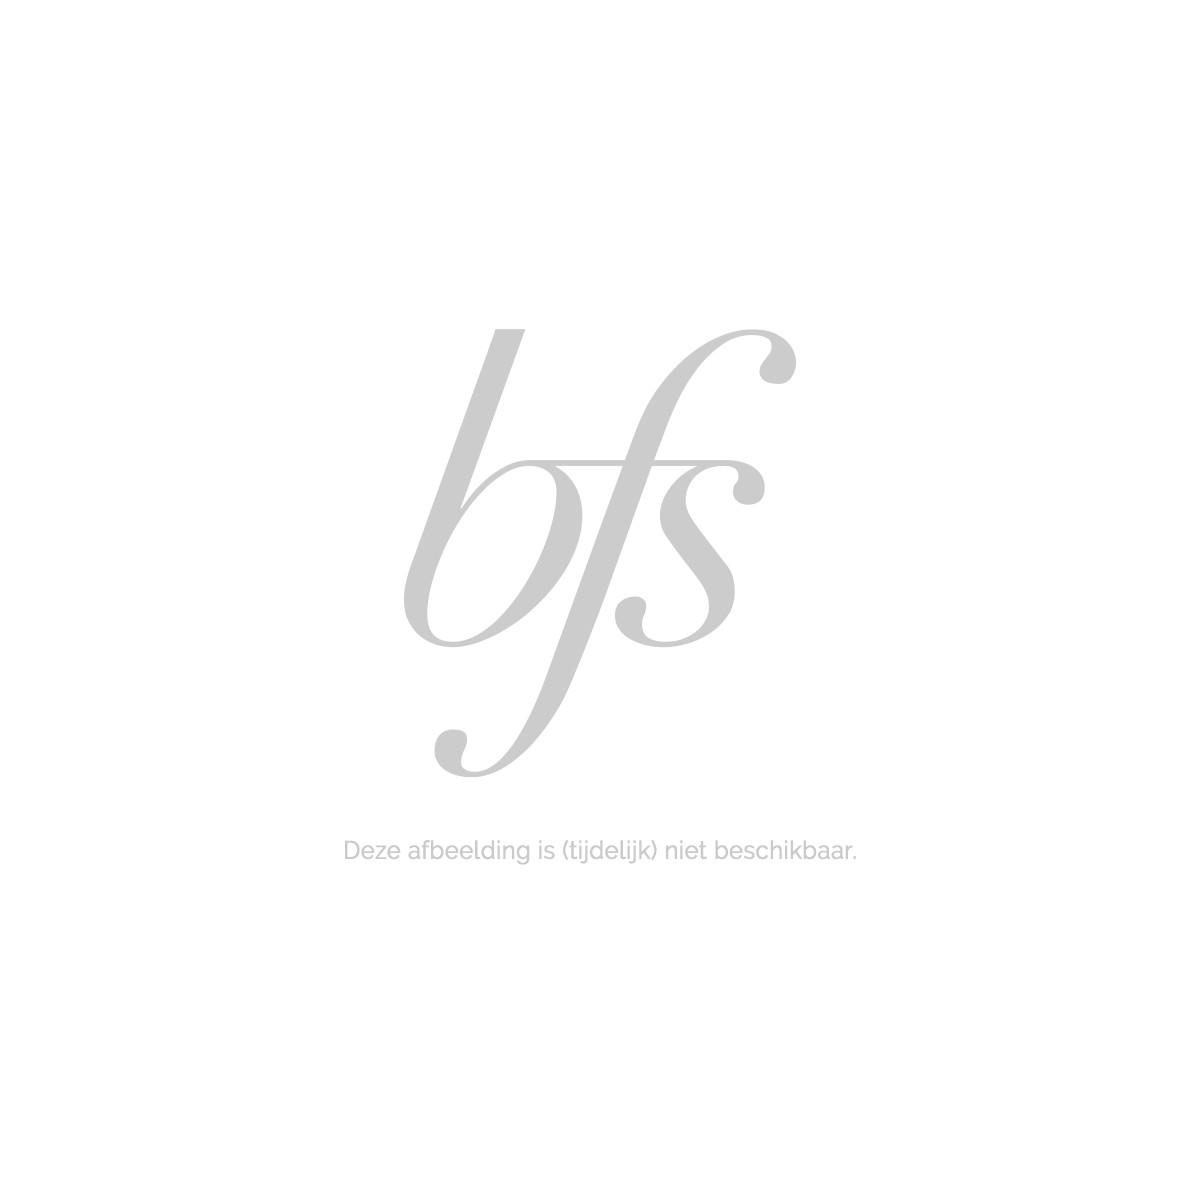 Afbeelding van Beautyblender Solid Cleanser Sponsjes Make up